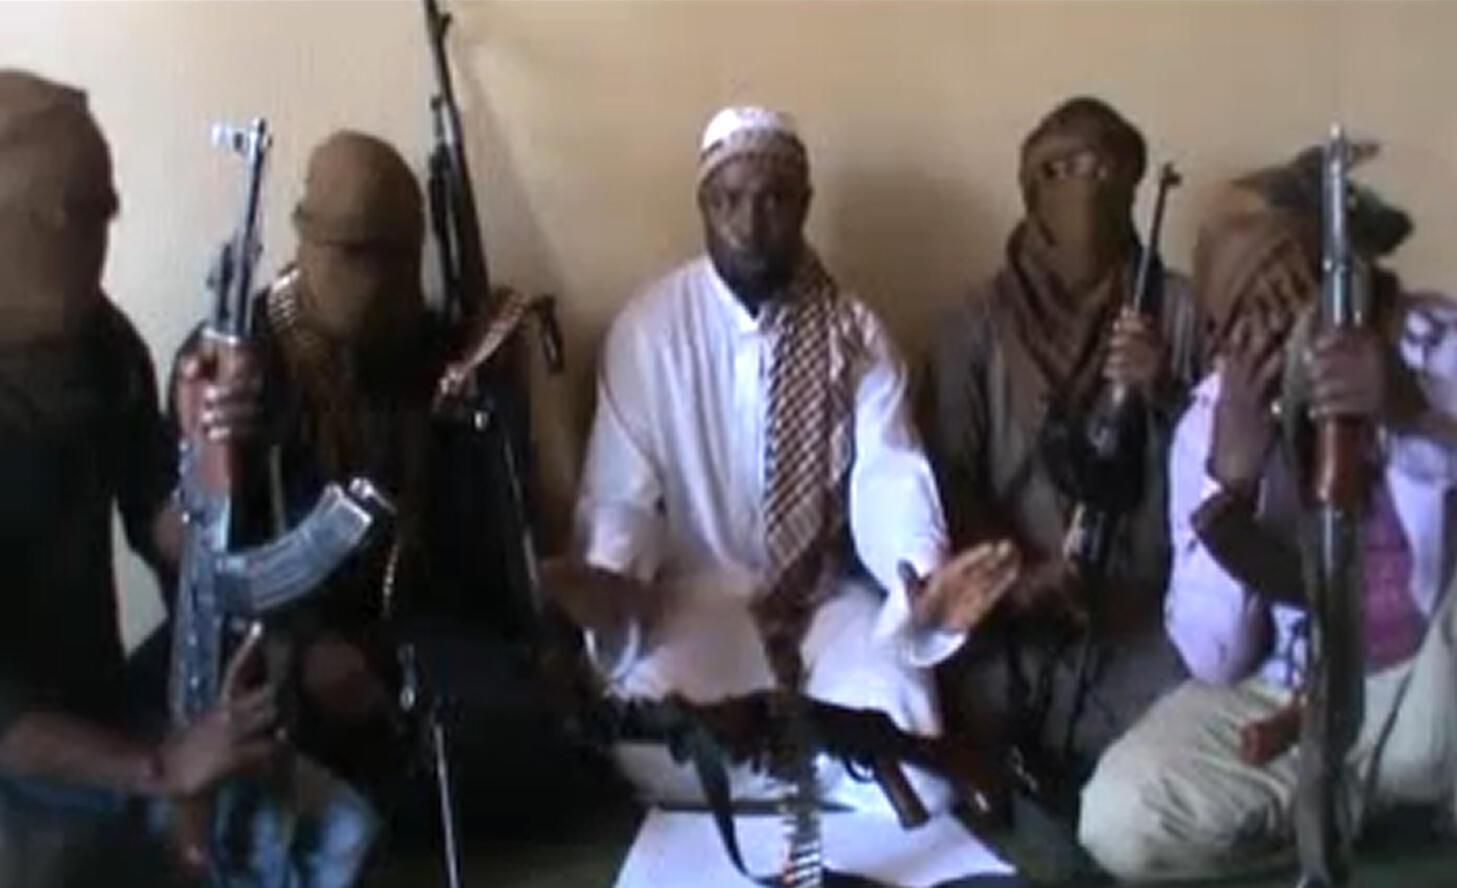 Combattants de la secte Boko Haram au Nigeria.